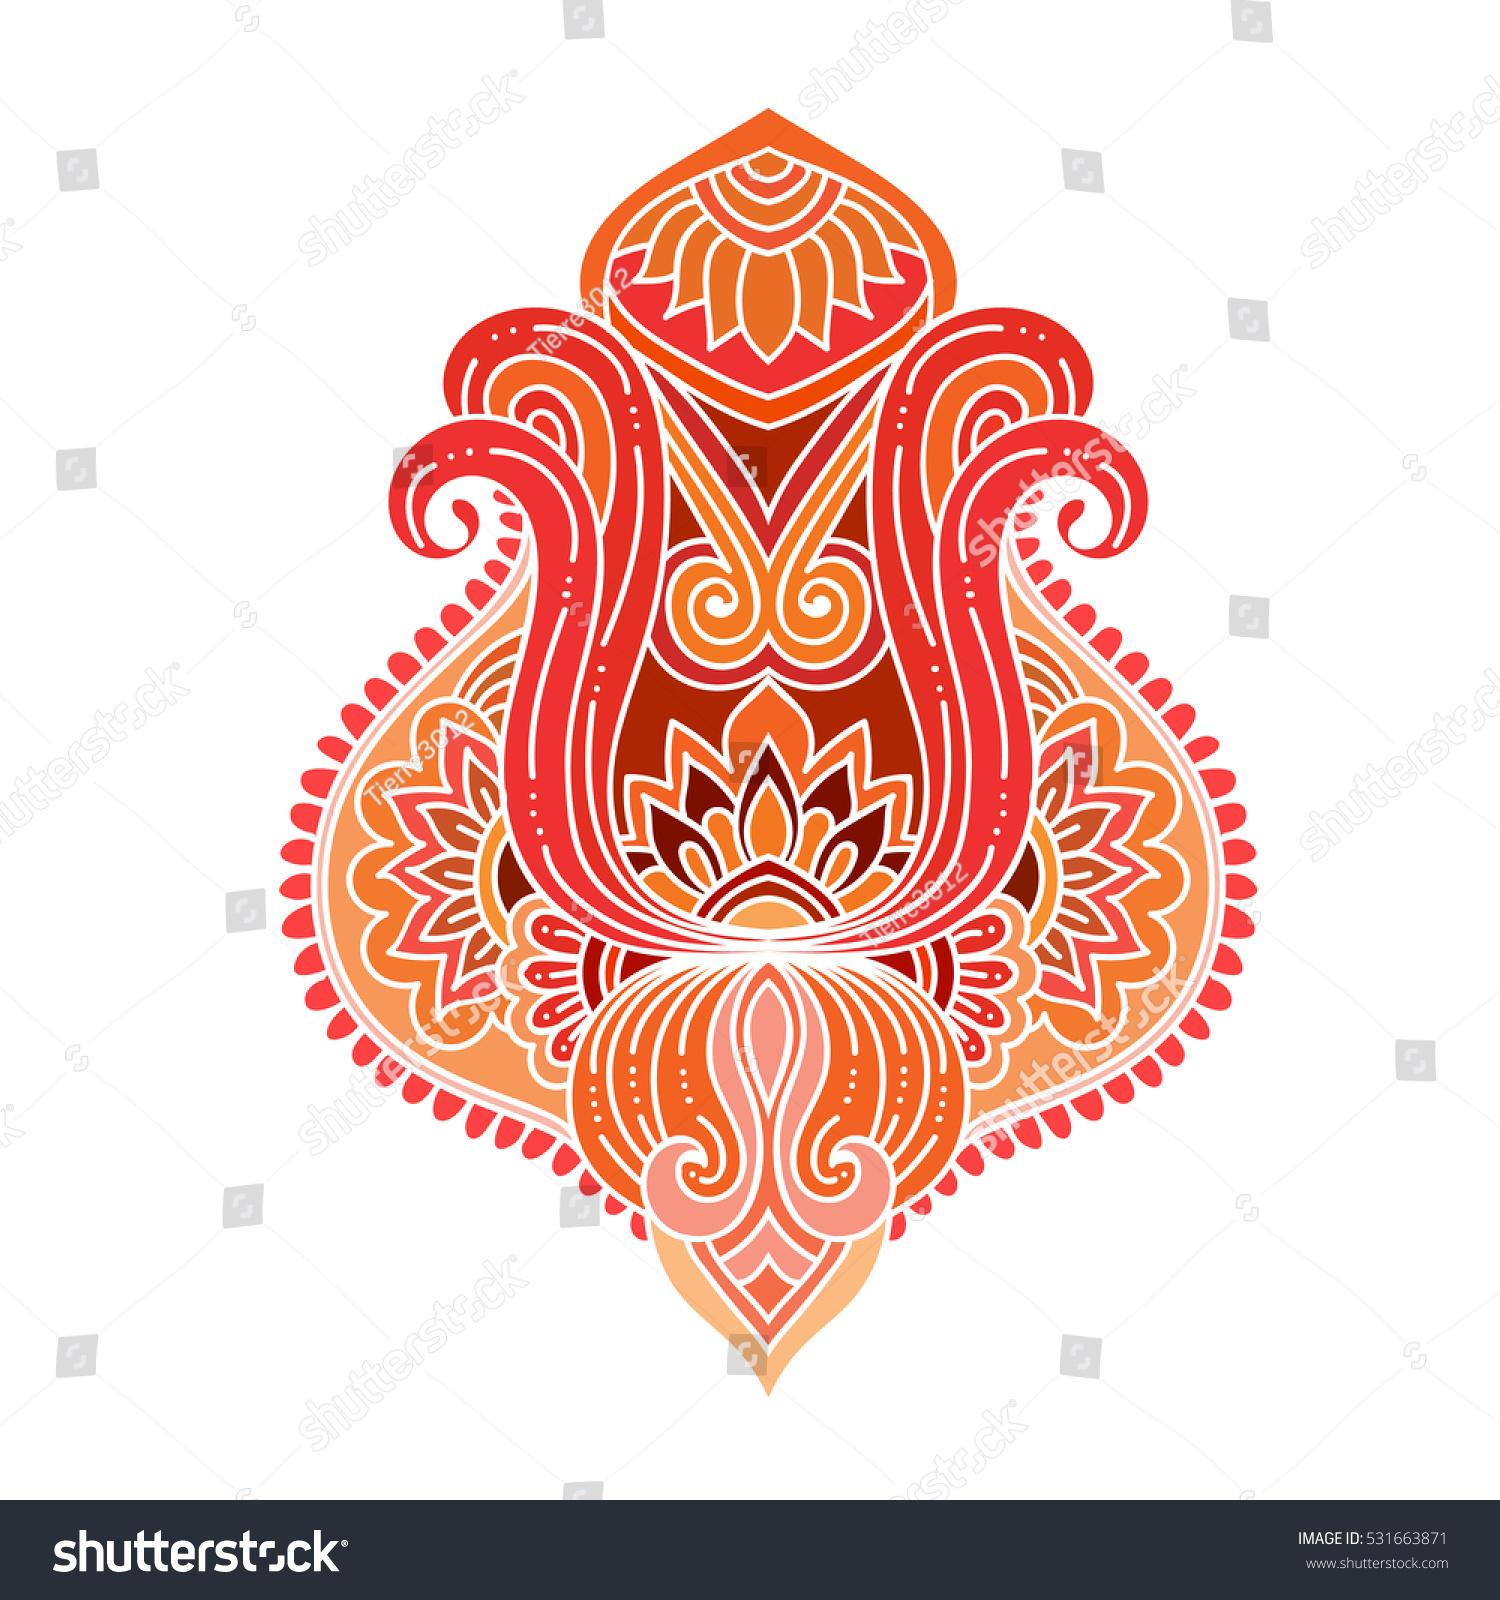 Stylized vector ornamental lotus flower ethnic stock photo photo stylized vector ornamental lotus flower ethnic art patterned indian paisley hand drawn illustration izmirmasajfo